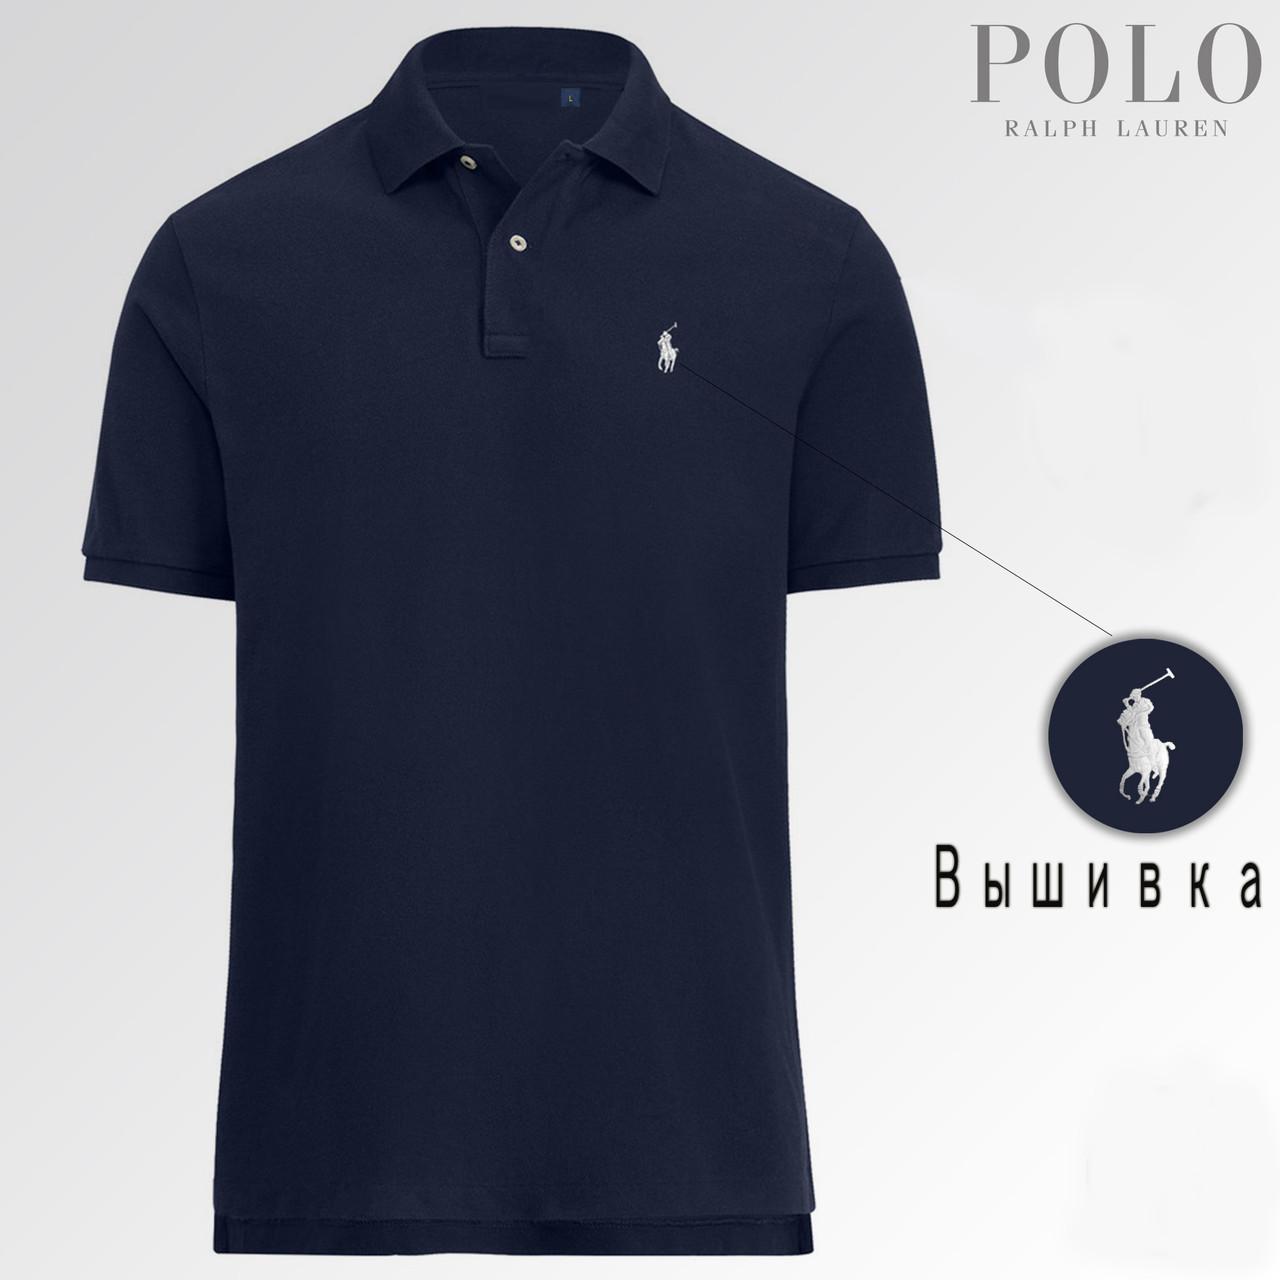 Футболка поло polo Ralph Lauren темно-синяя  вышивка логотип реплика